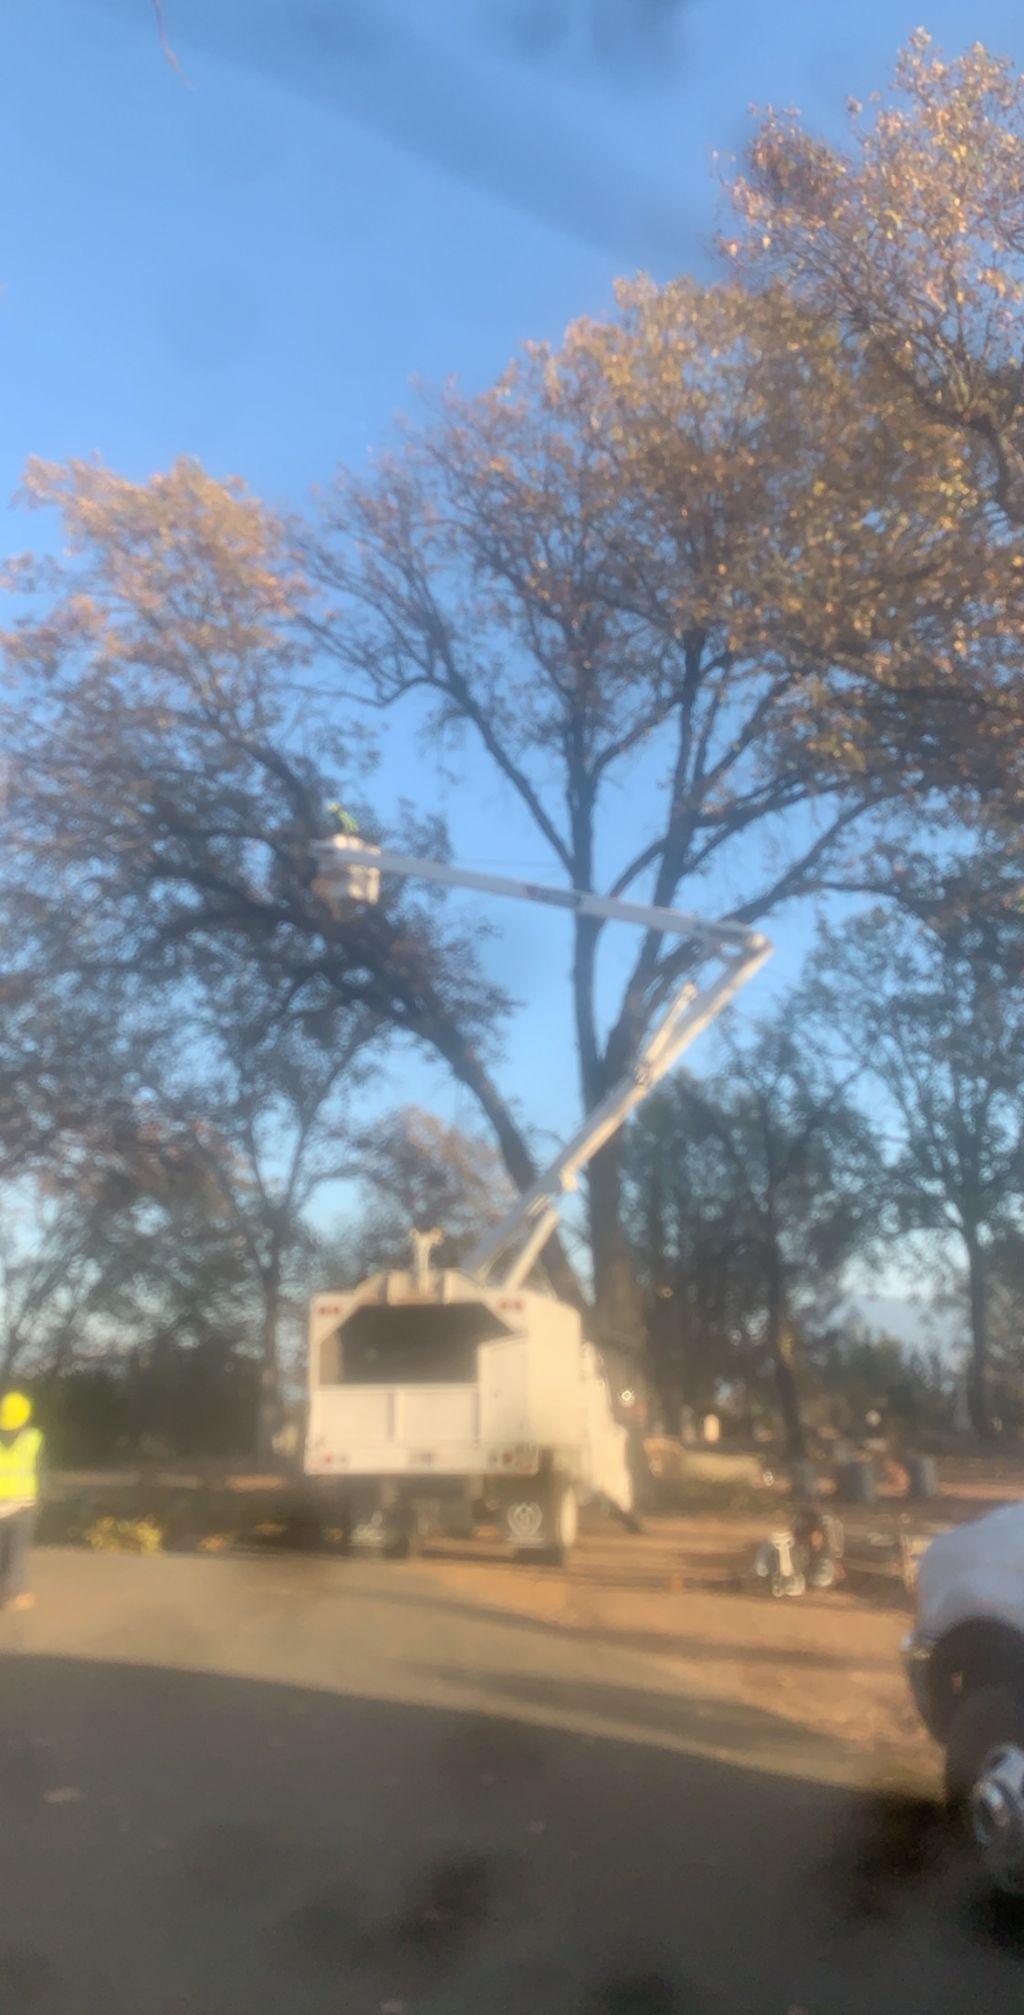 L.c.t.s tree service (lake county tree service)